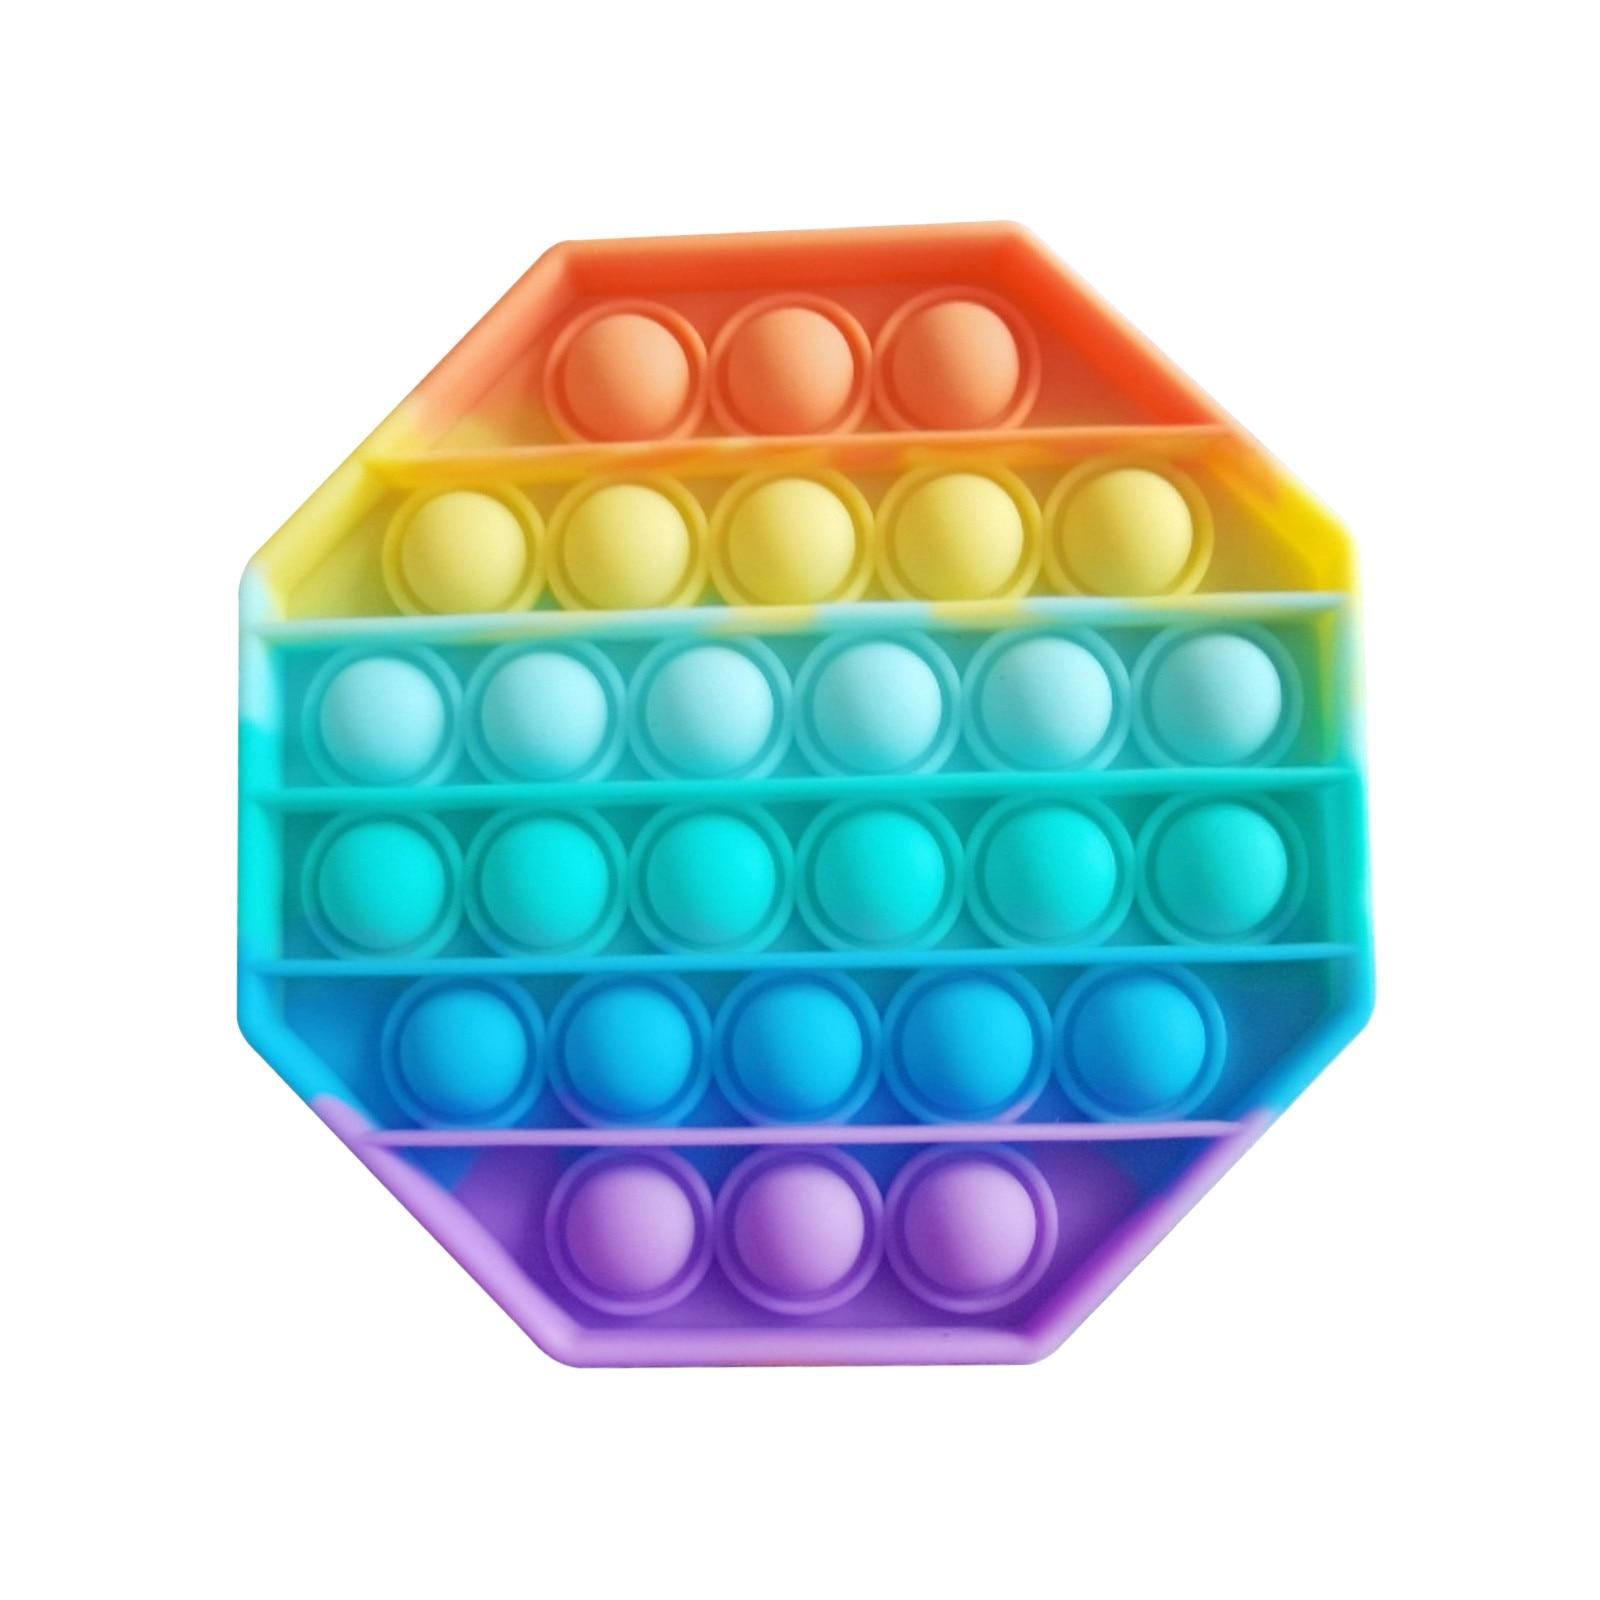 Poppit Toy Fidget-Toys Sensory-Toy Autism Gift Bubble-Pop Stress Reliever Funny Kids img4